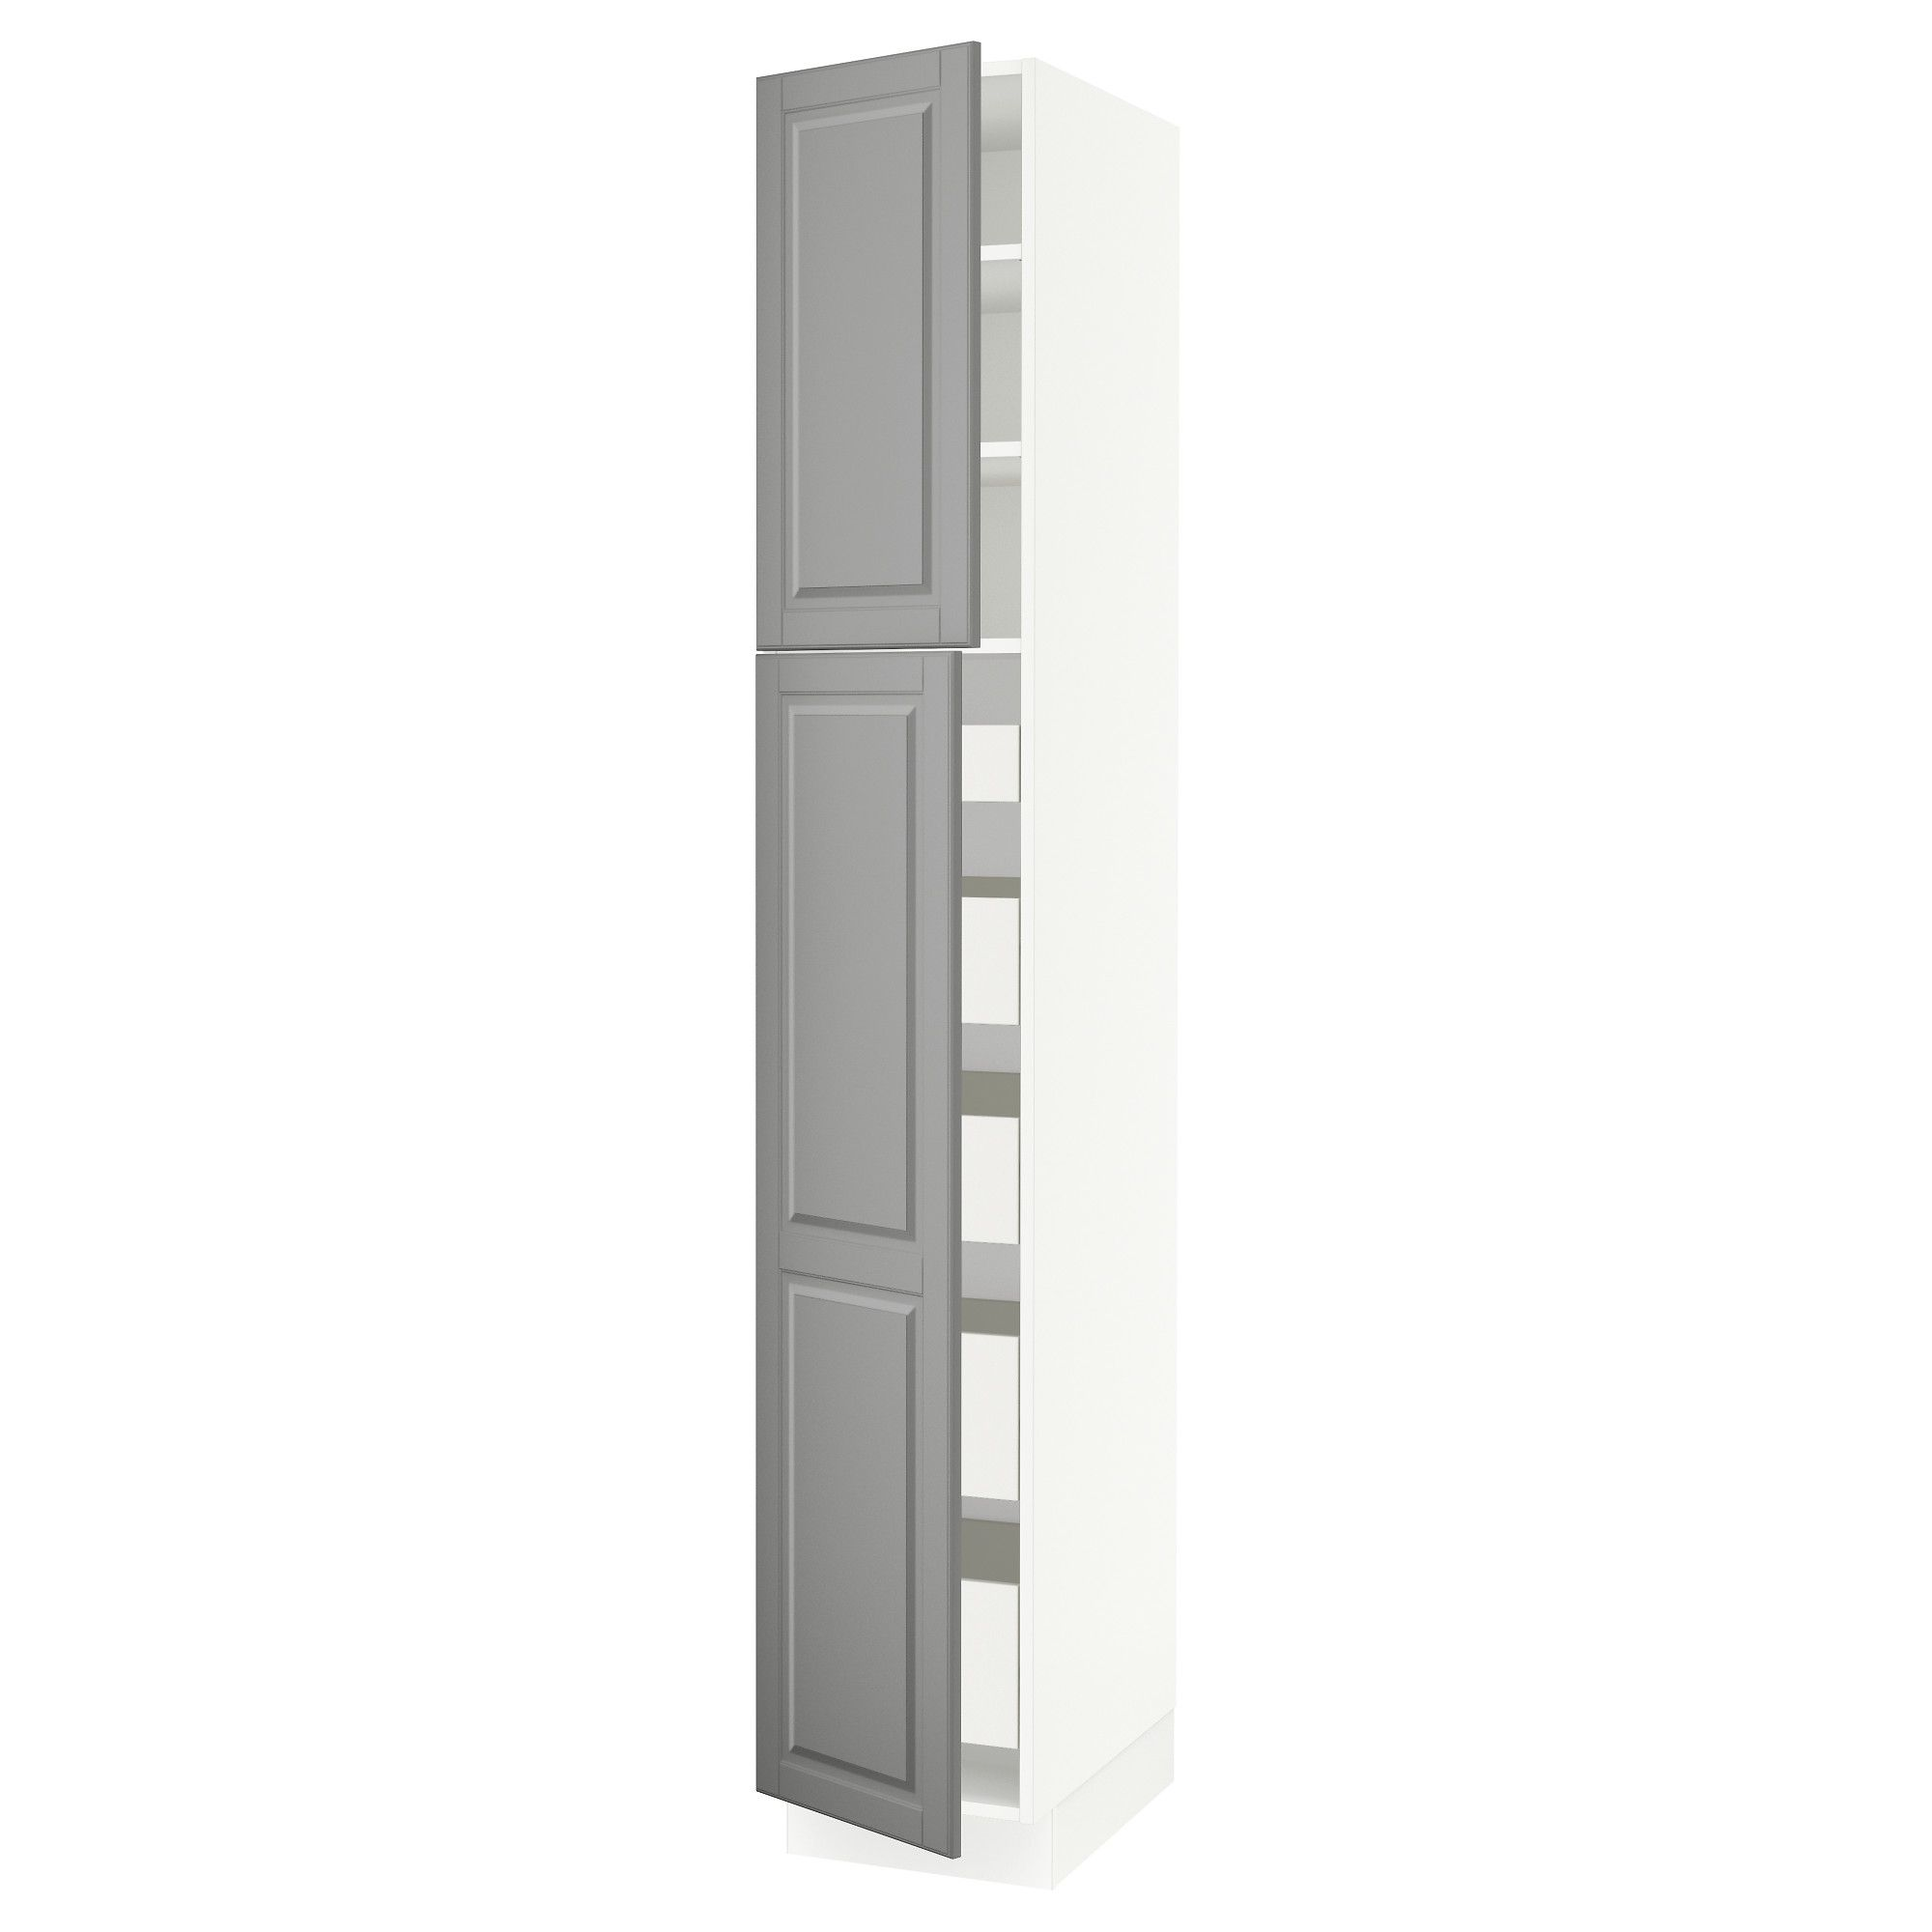 Ikea Sektion White High Cabinet W 2 Doors Amp 5 Drawers